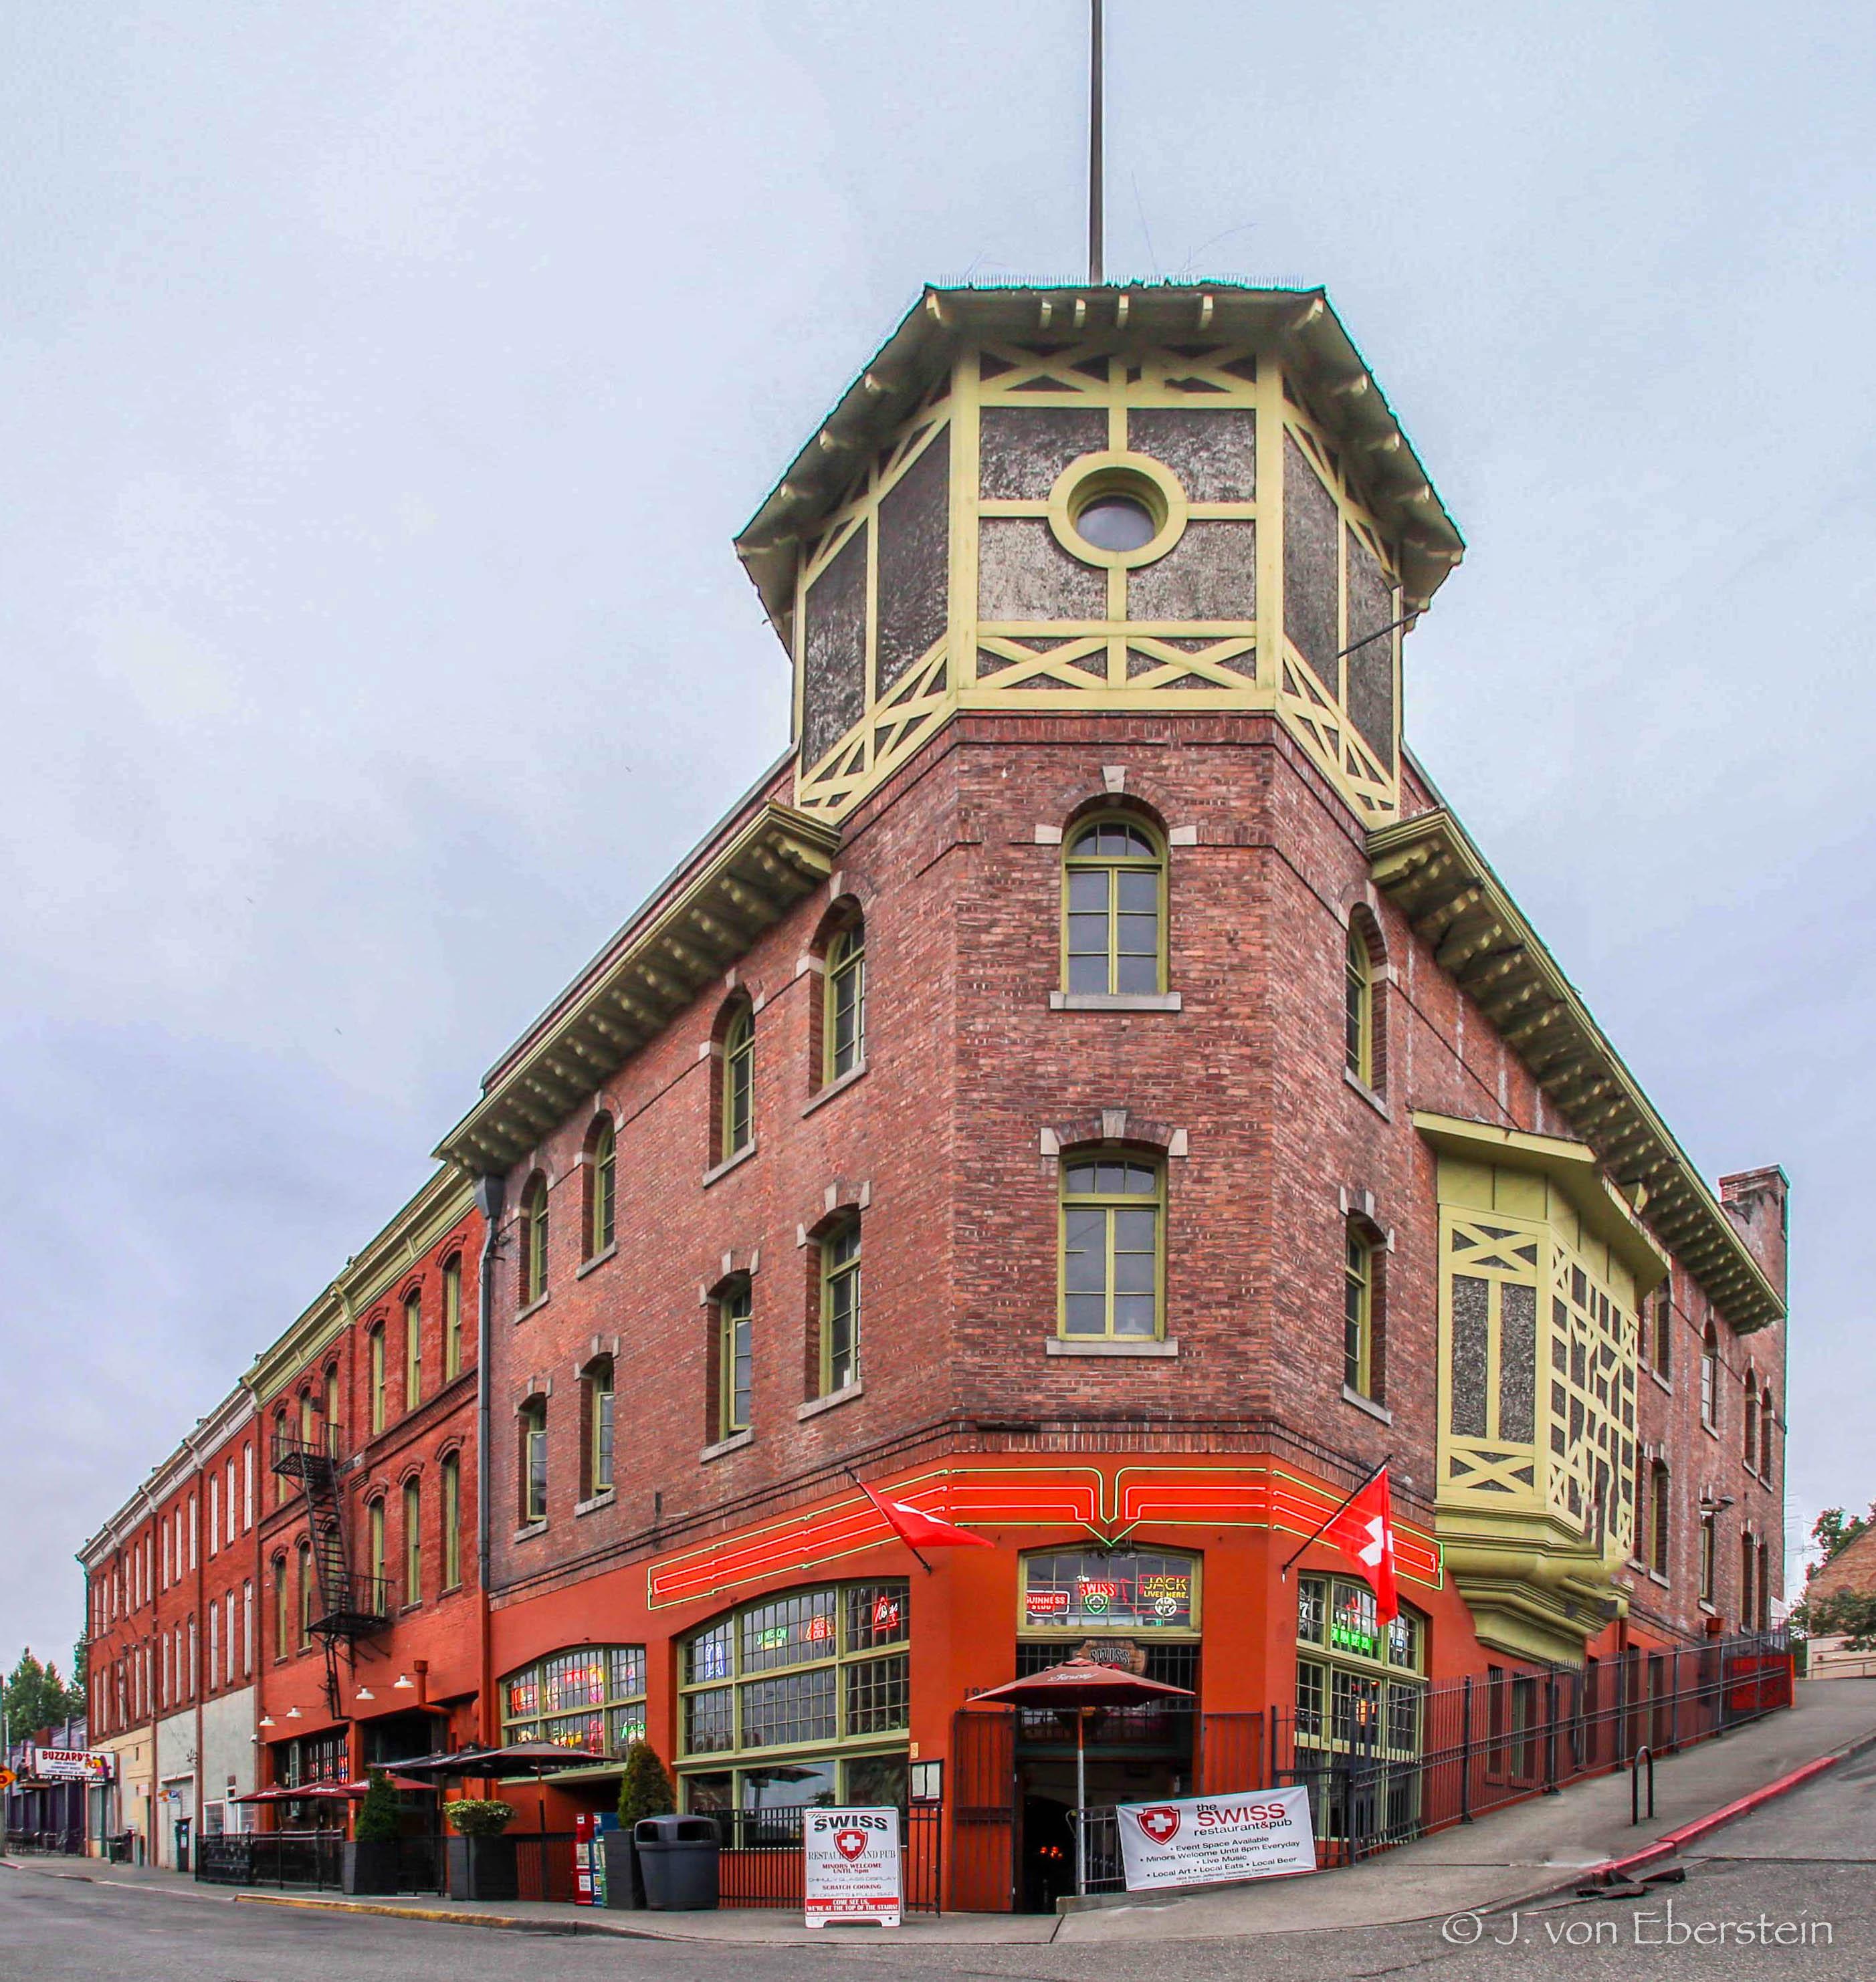 The Swiss Restaurant, Tacoma, WA